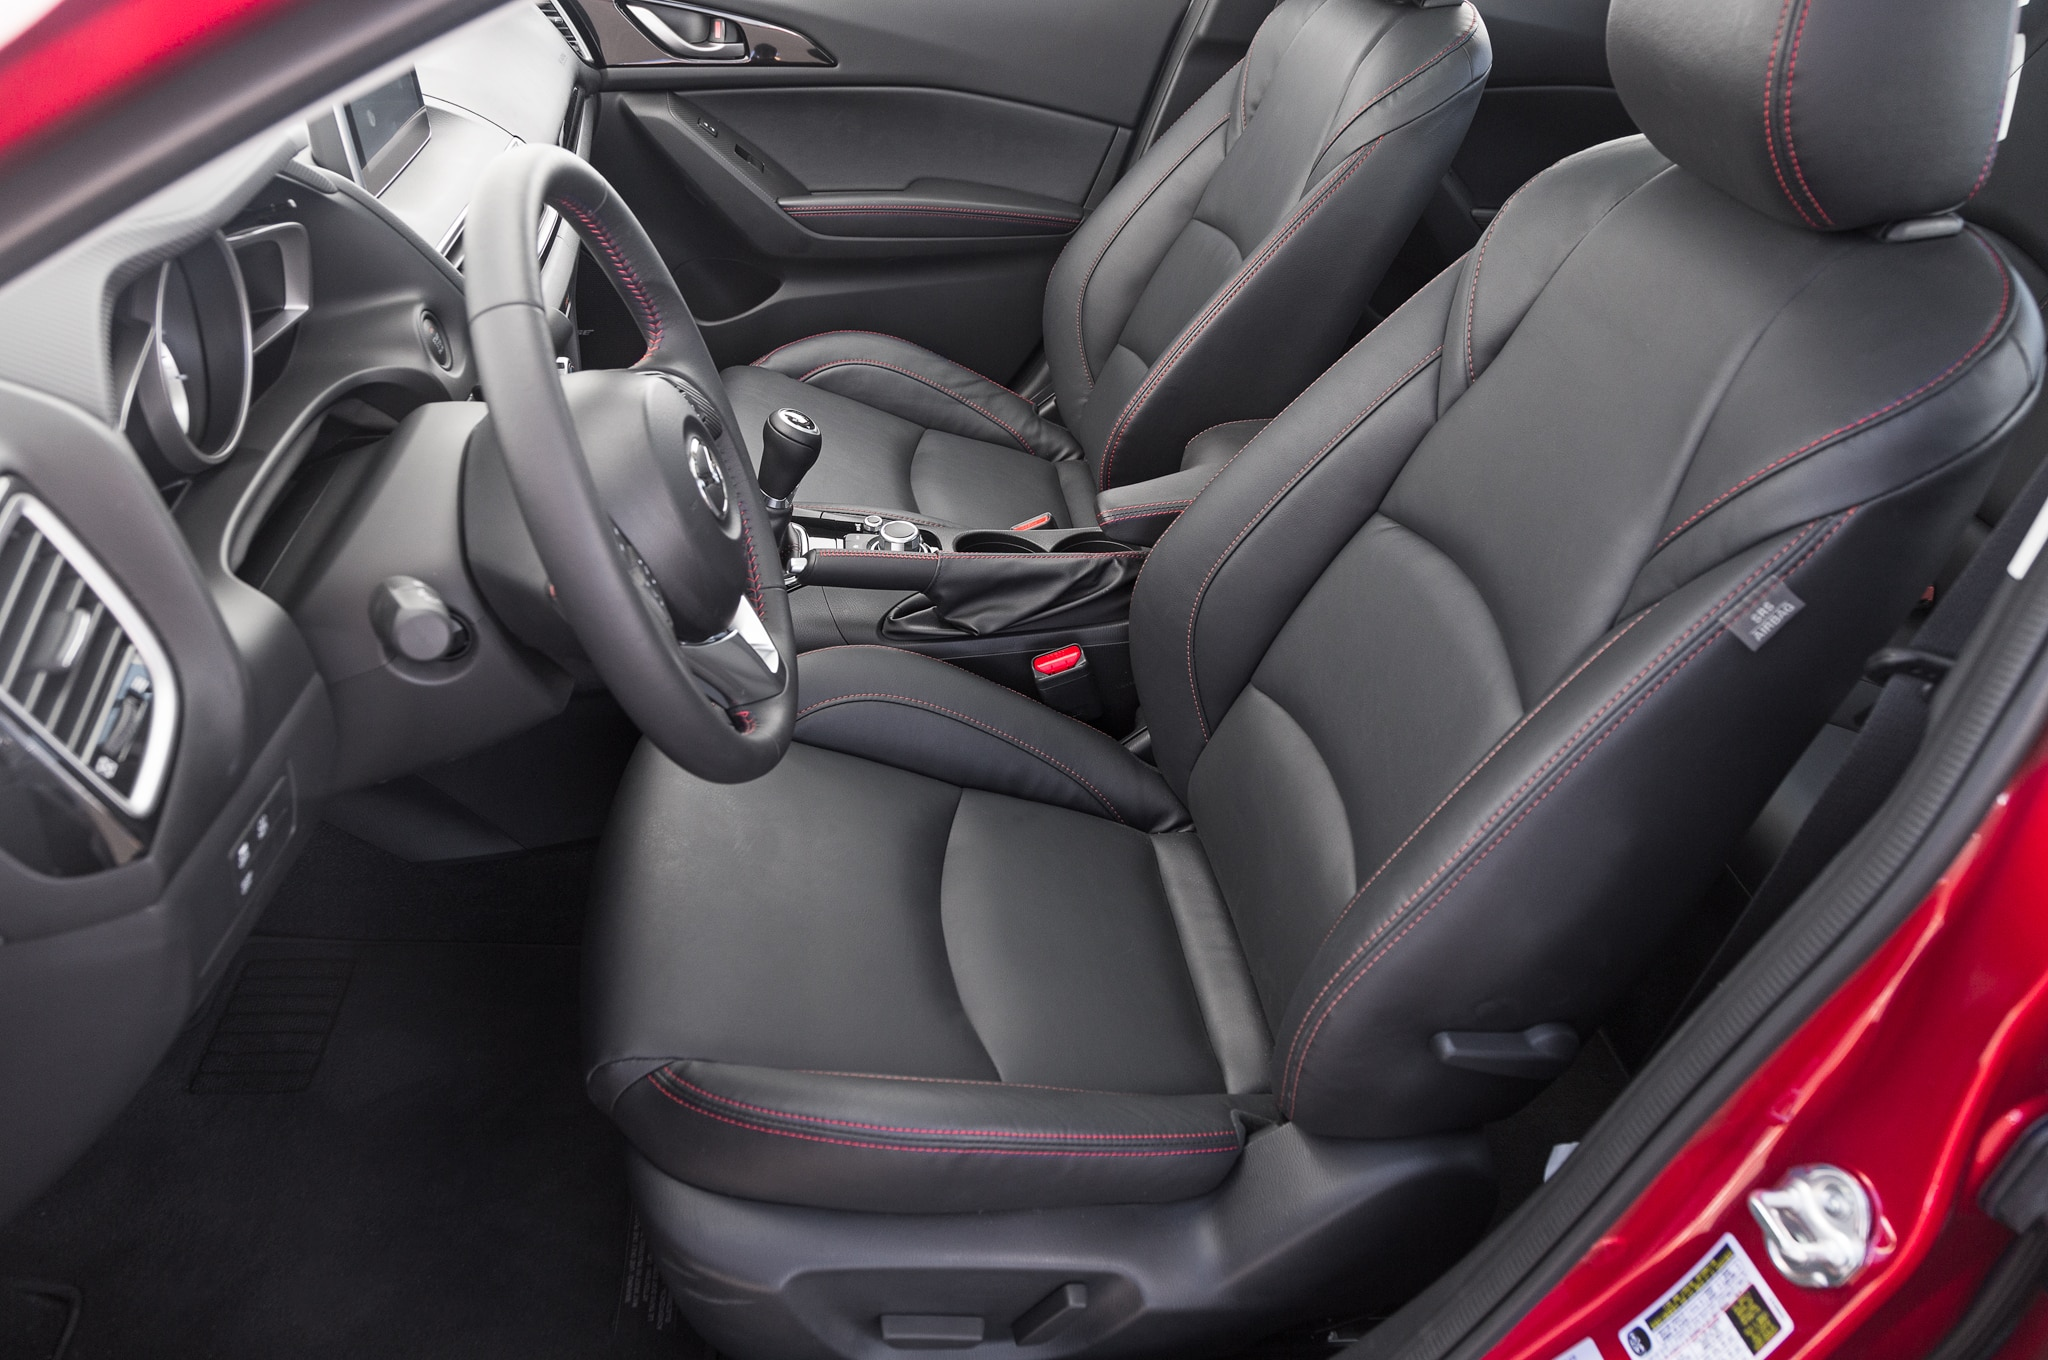 Image Gallery Mazda Seats